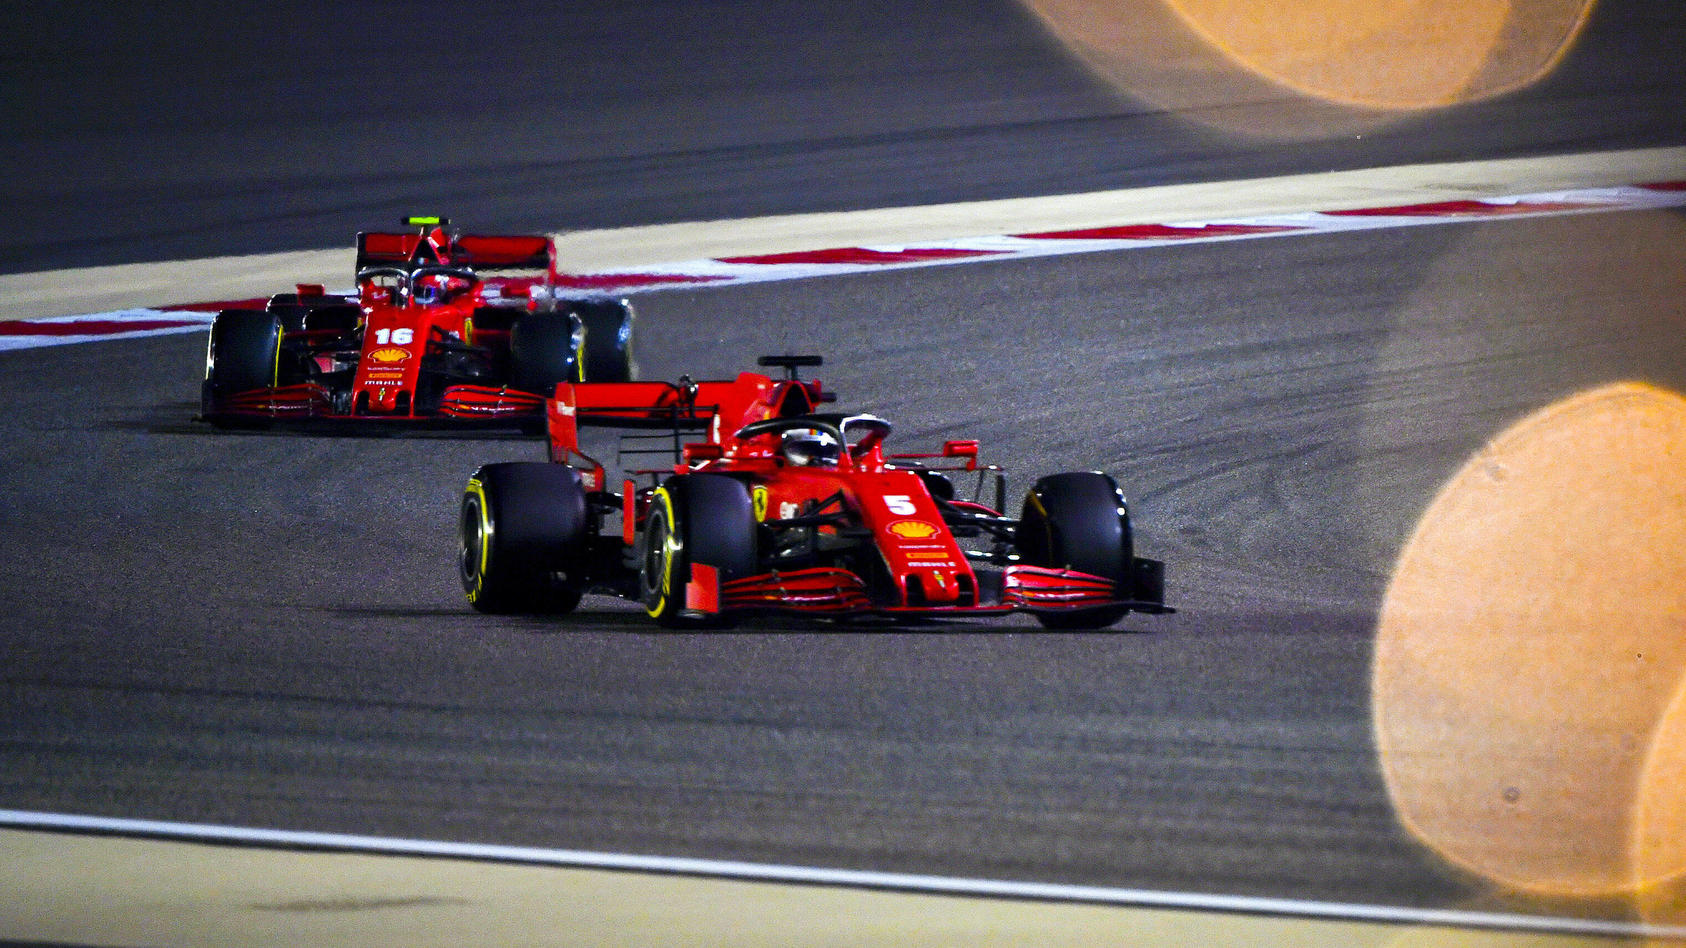 Ferrari fuhr 2020 in der Formel 1 hoffnungslos hinterher